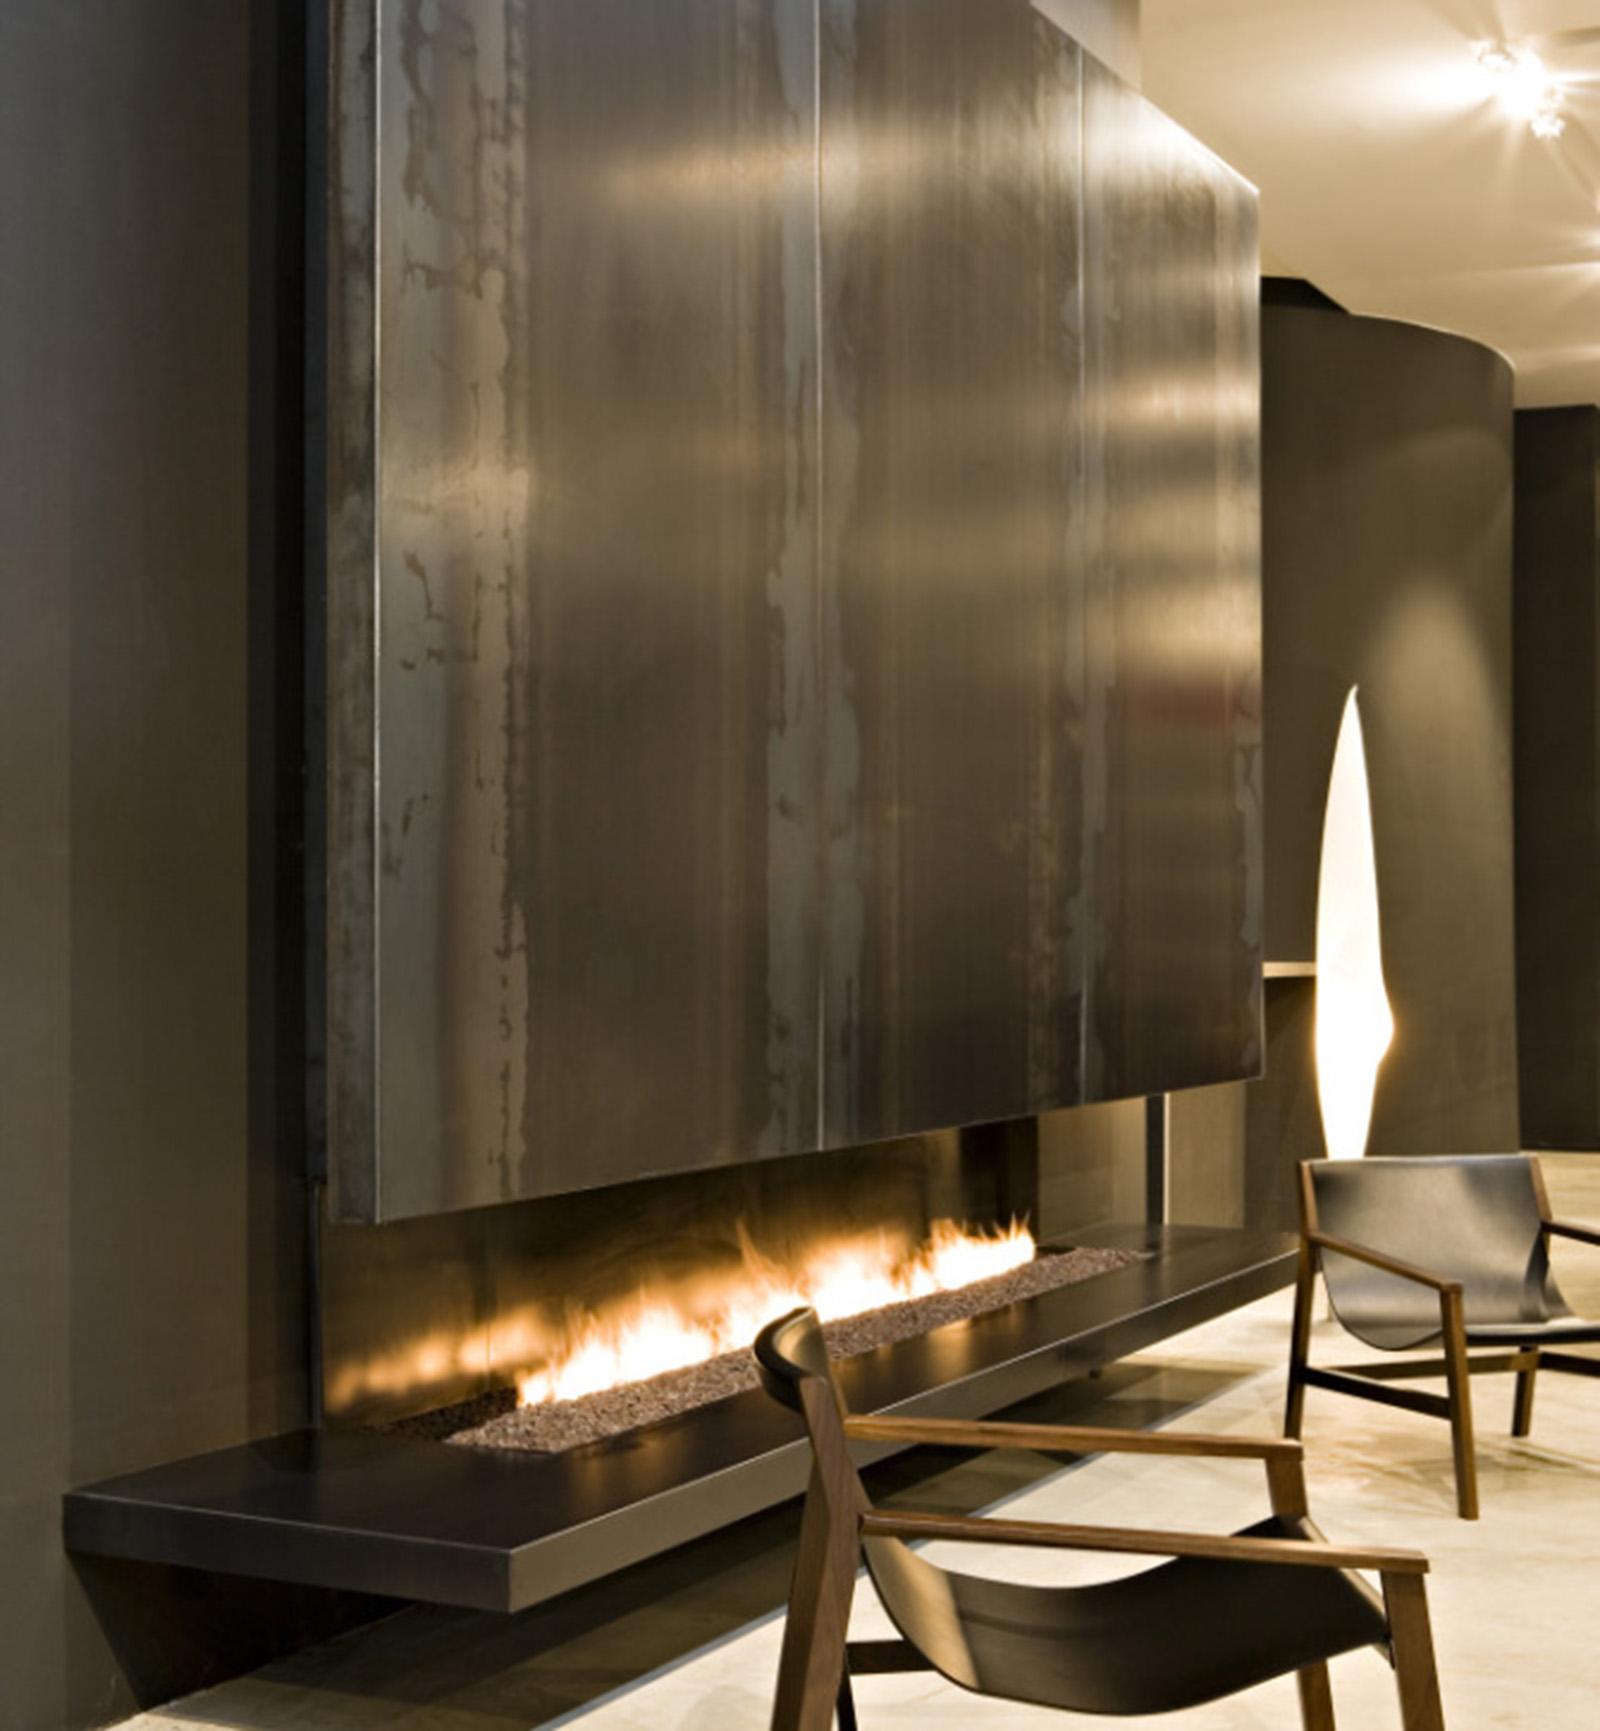 cheminee au gaz waco viving. Black Bedroom Furniture Sets. Home Design Ideas